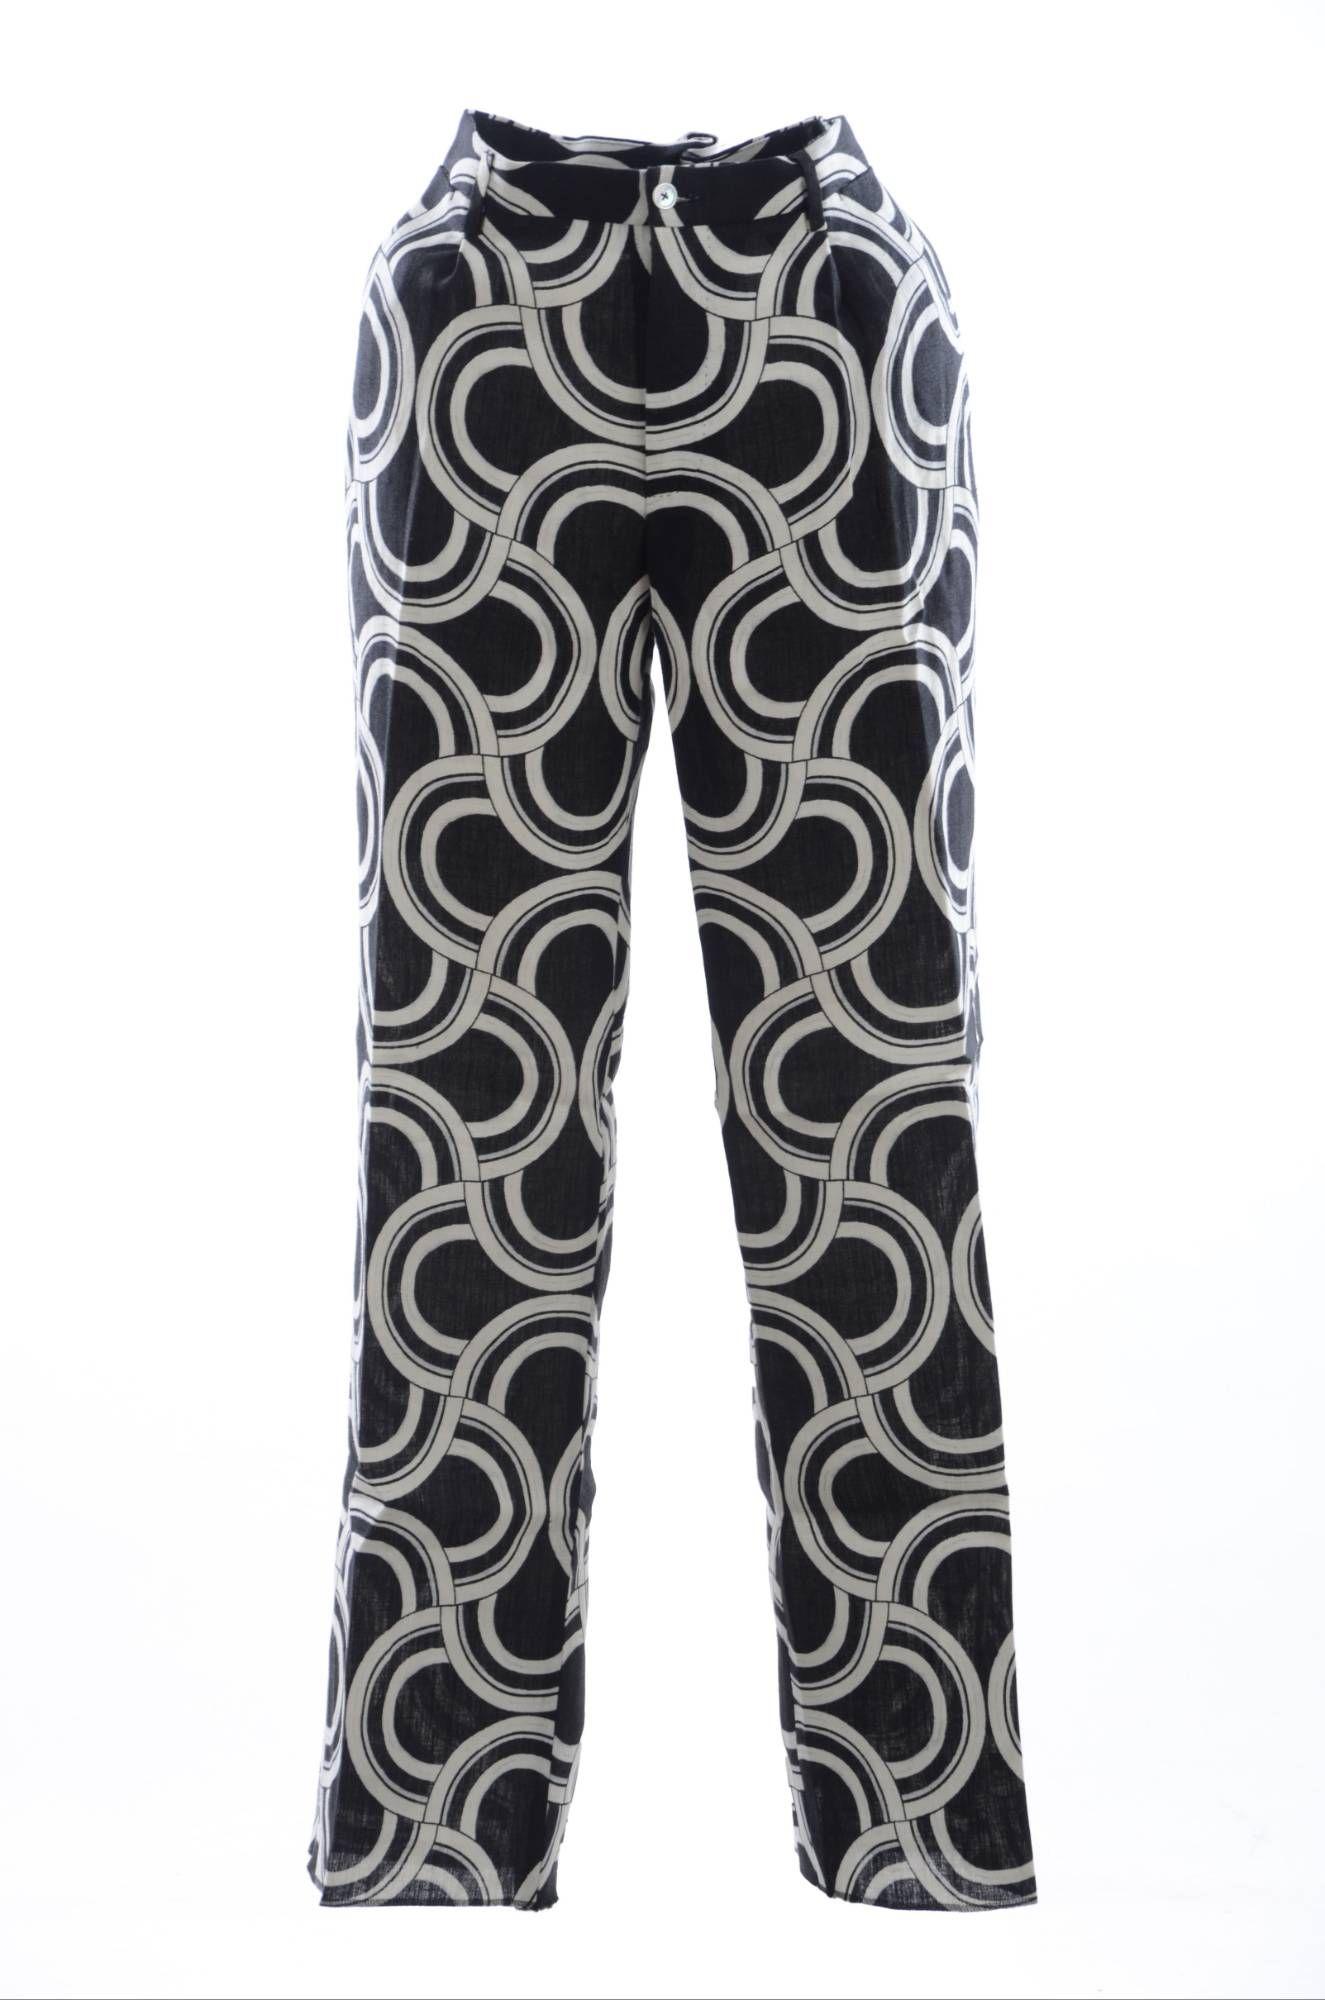 Dolce & Gabbana Men Trouser